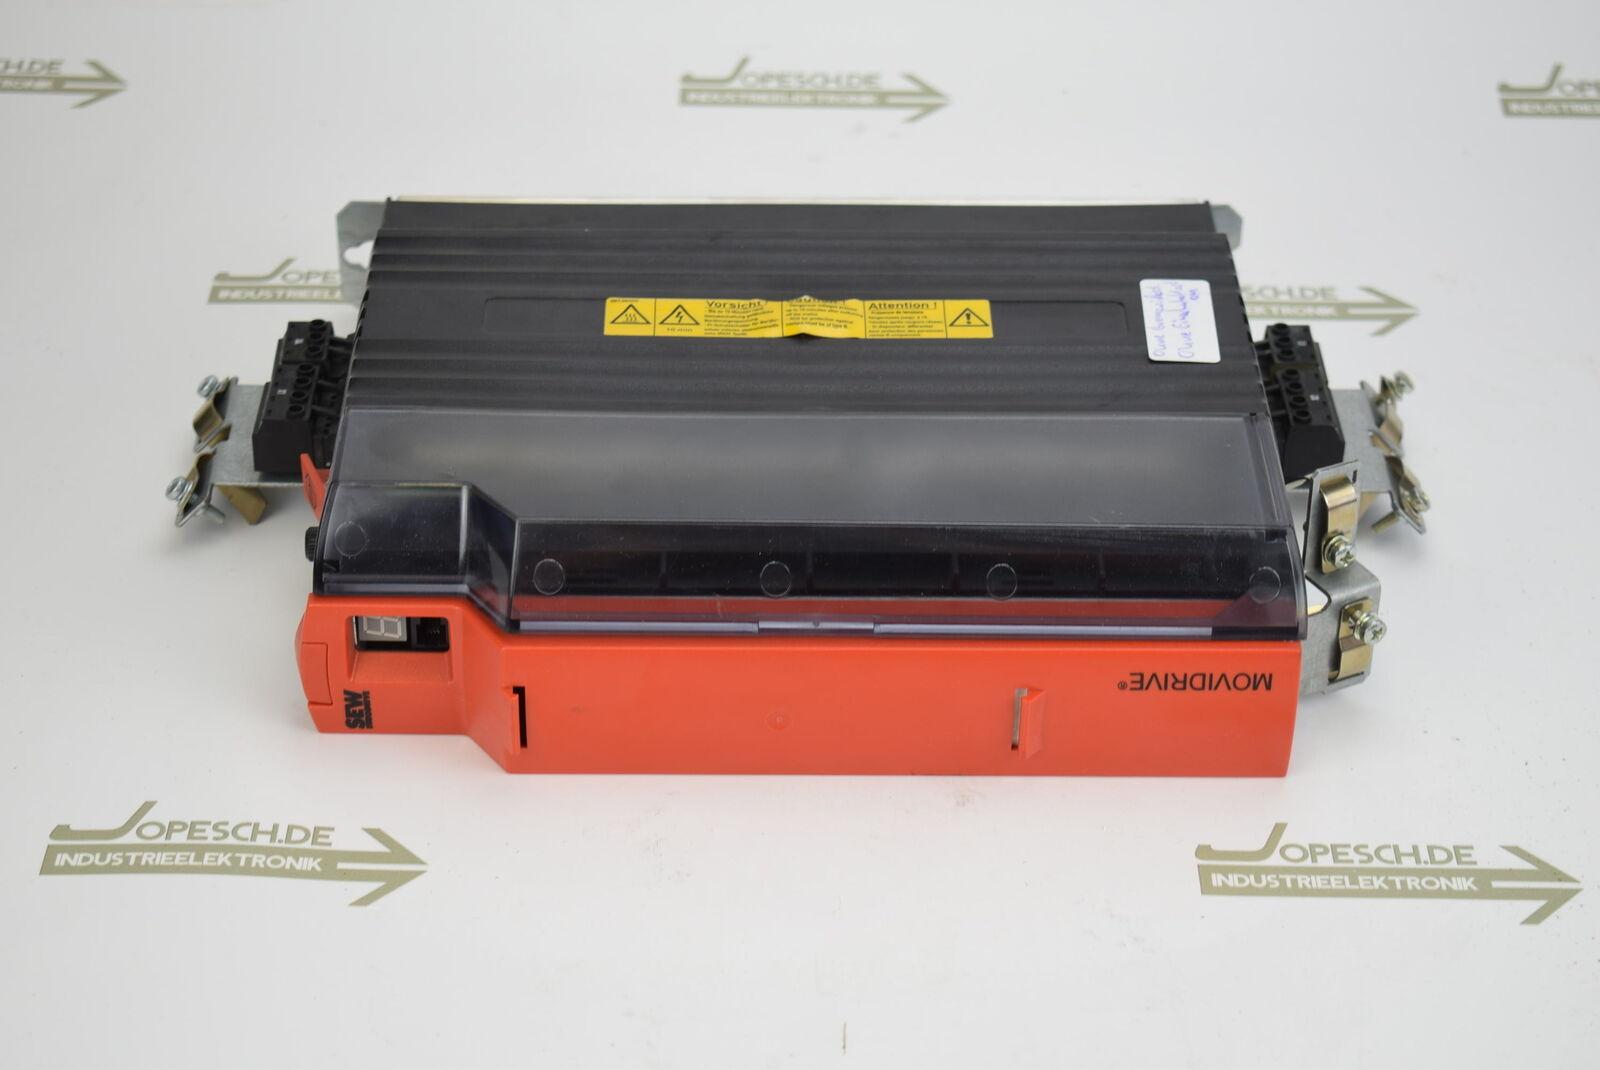 MDX61B0008-5A3-4-0T 08277354 SEW Movidrive Frequenzumrichter 0,75 kW Typ